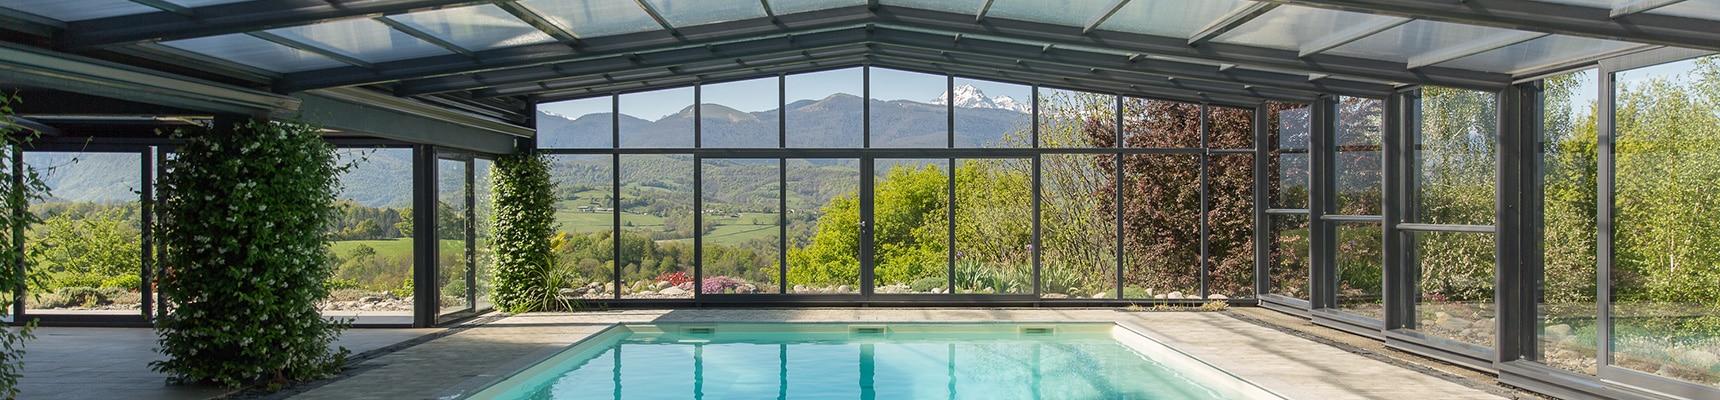 v nus fabricant fran ais d 39 abris de piscine depuis 1987. Black Bedroom Furniture Sets. Home Design Ideas